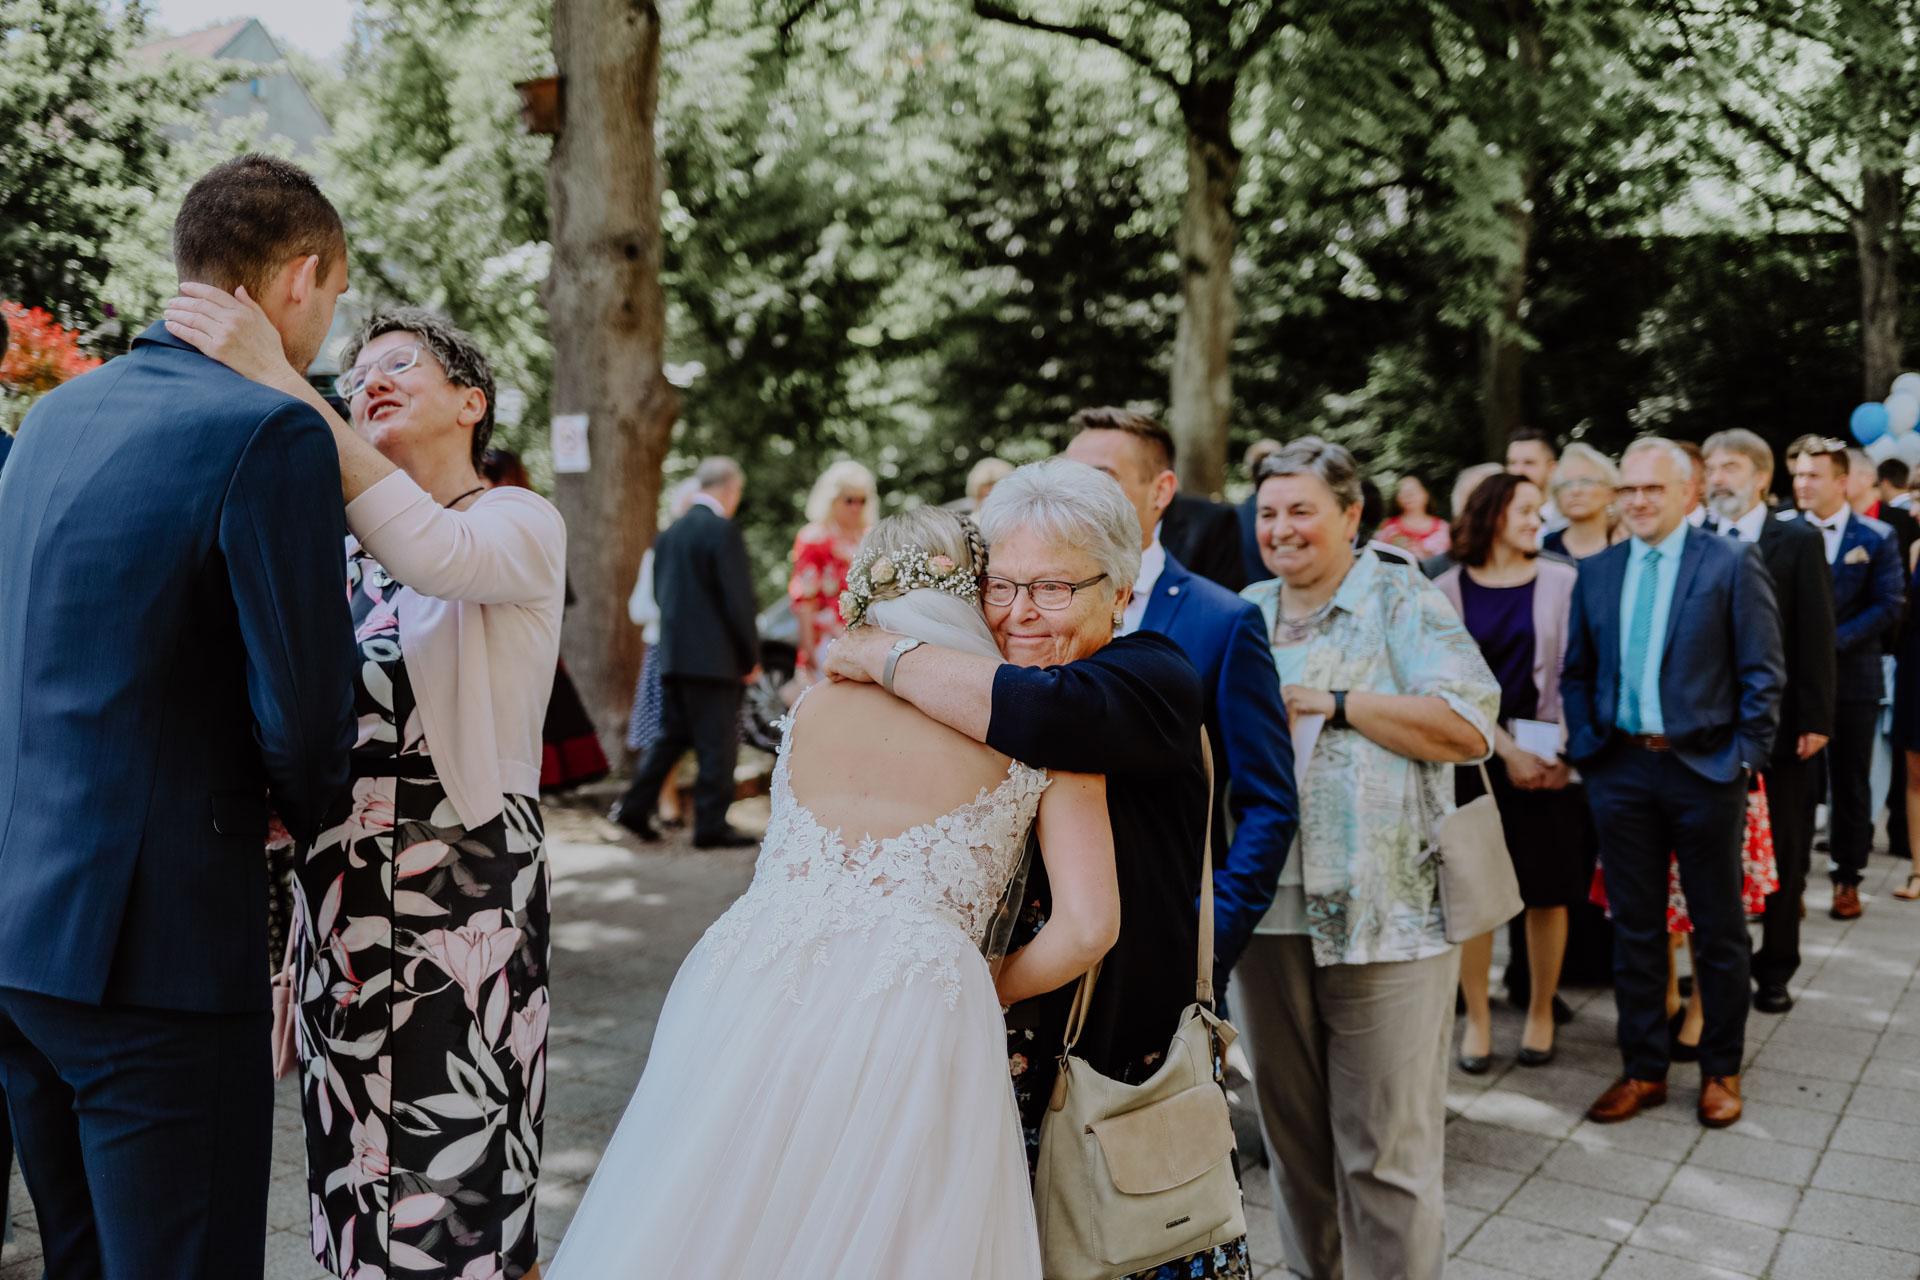 Oma umarmt ihre Enkelin